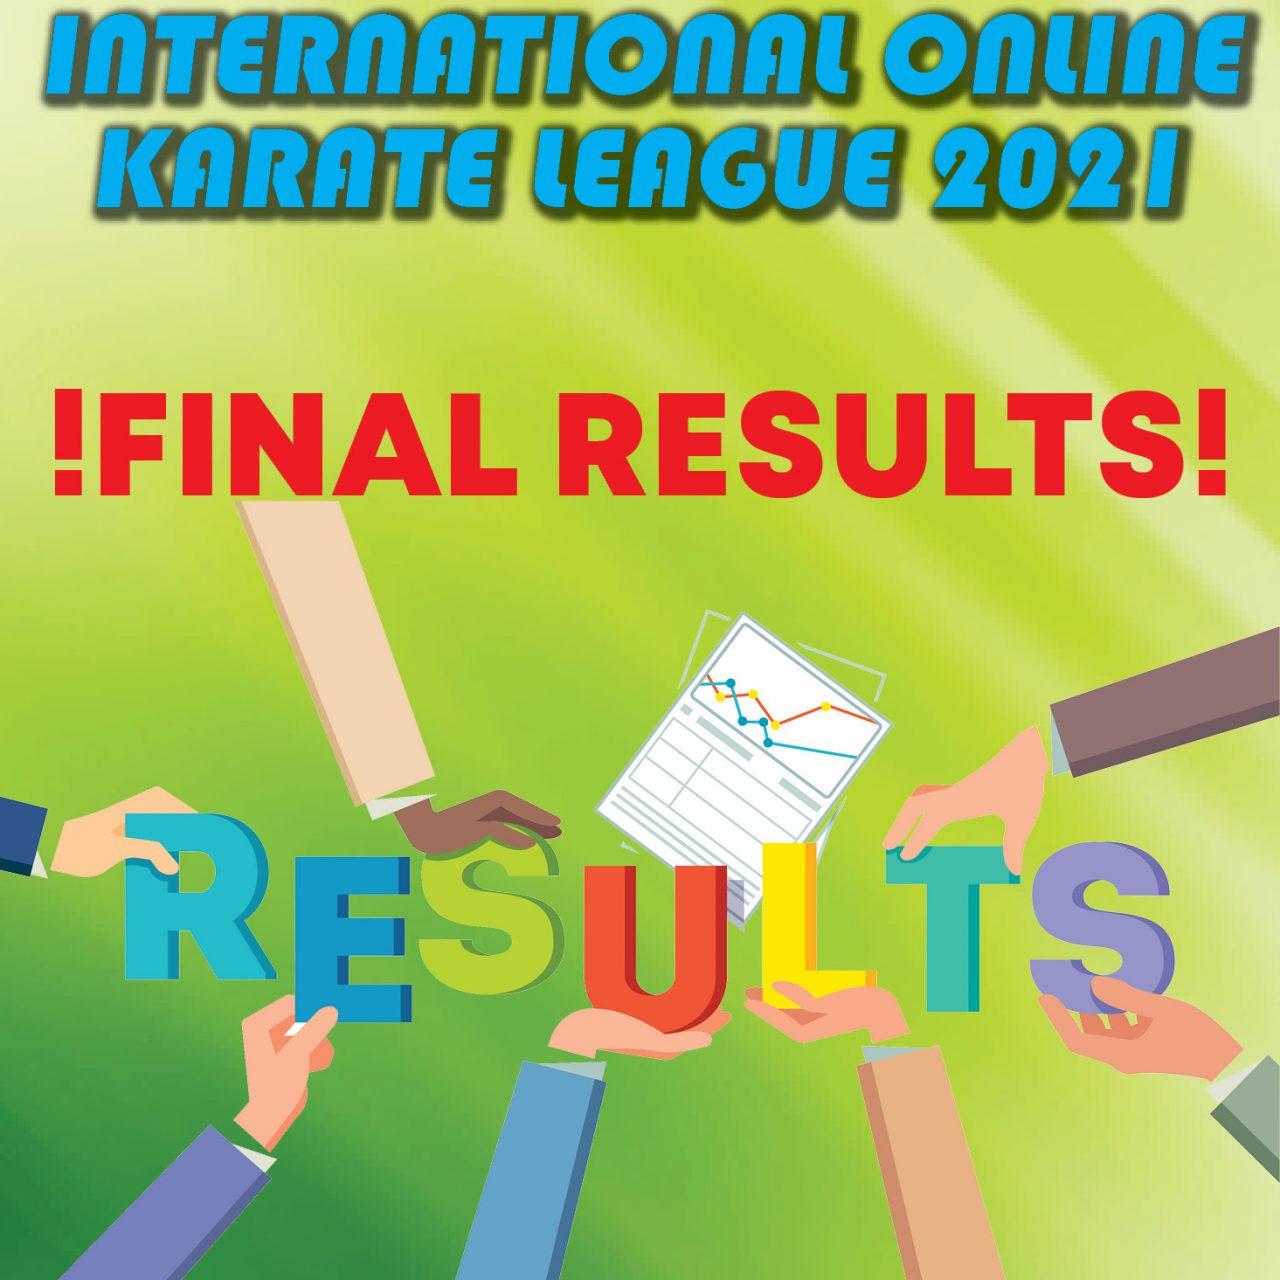 https://karate-slovakia.sk/wp-content/uploads/results-4-1280x1280.jpg